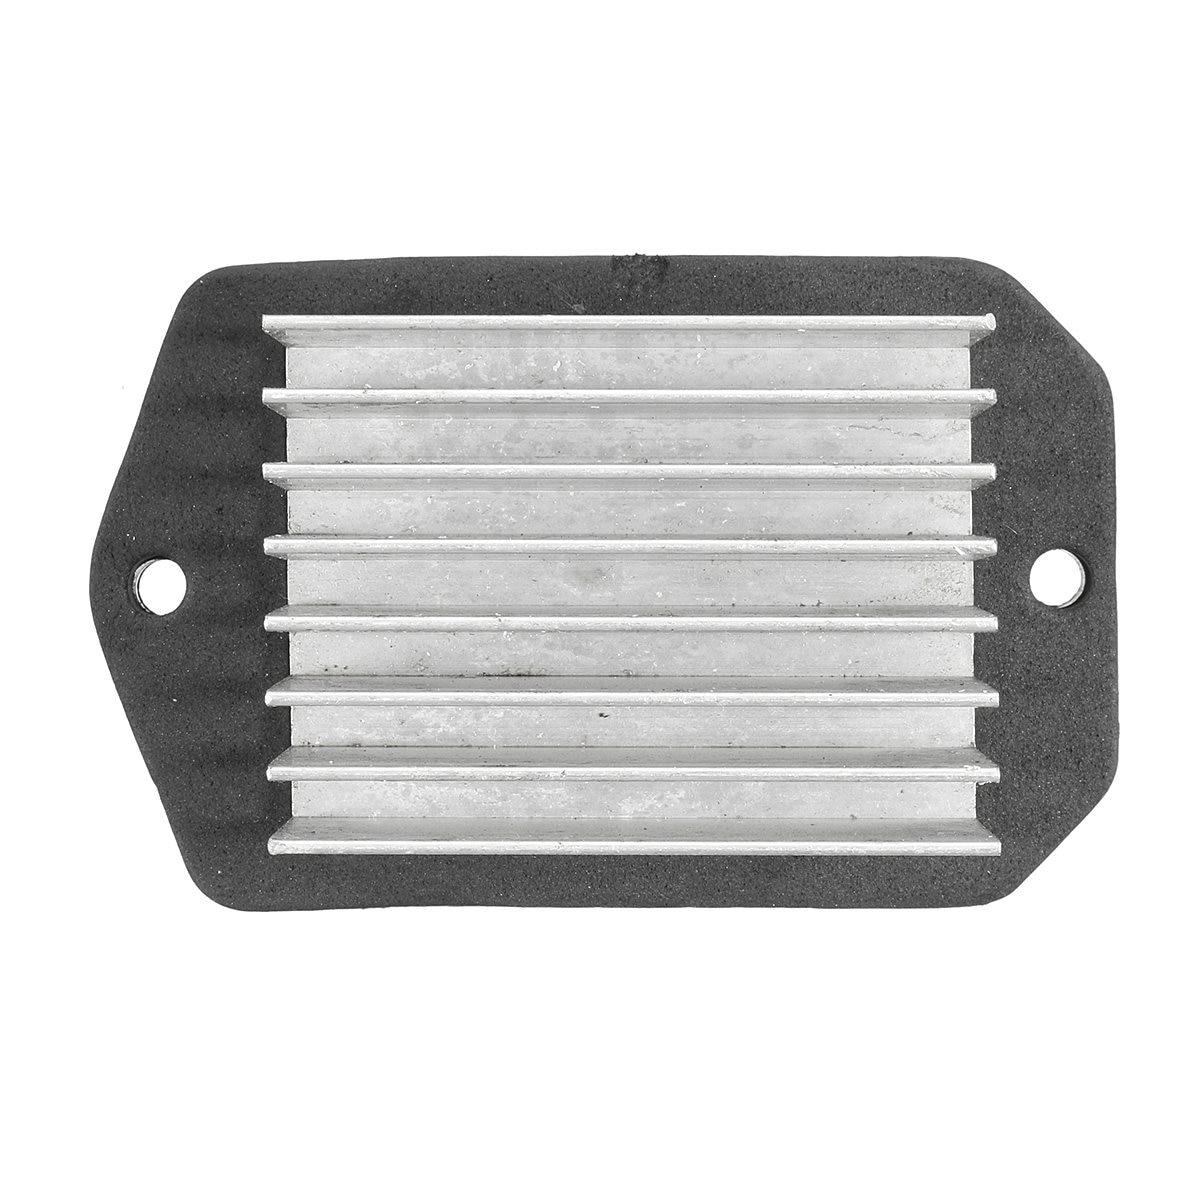 4 Pins Blower Motor Heater Fan Resistor For Honda Crv Cr V 2001 2006 Wiring Diagram 97 077800 0710 In Motors From Automobiles Motorcycles On Alibaba